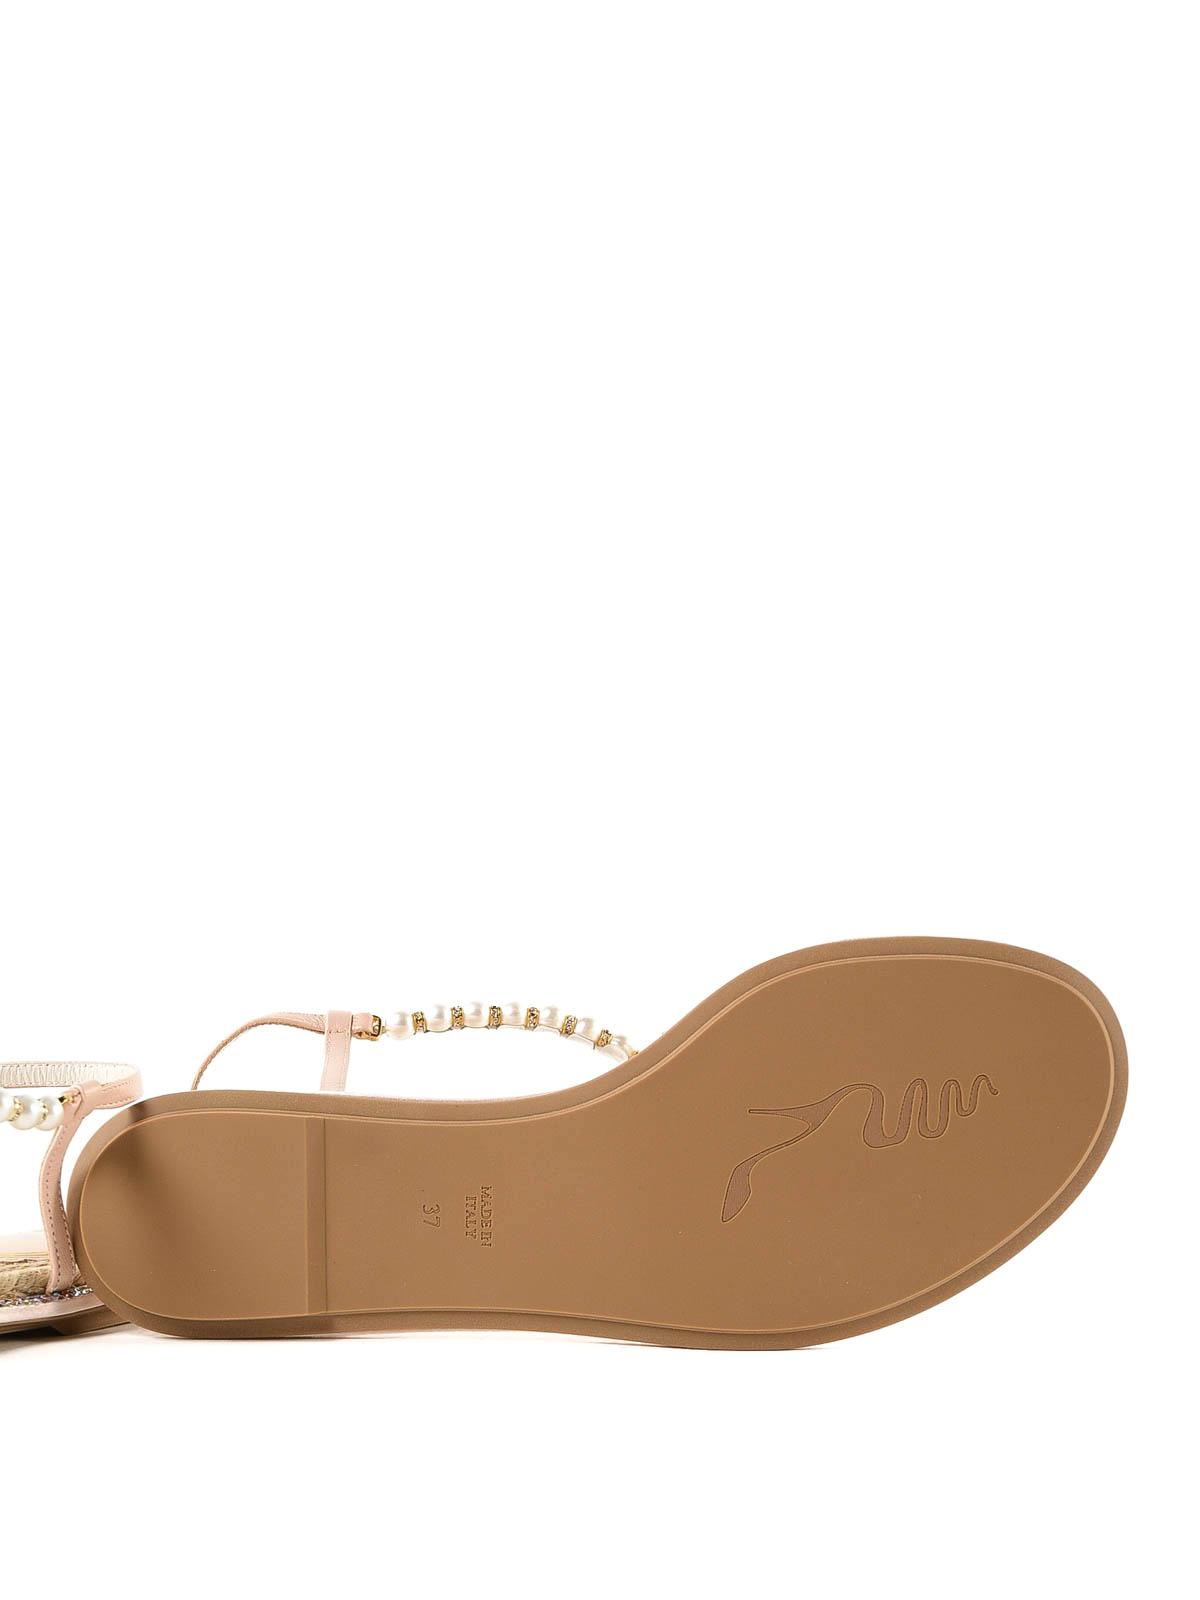 16e58a02ccc RENE CAOVILLA buy online Eliza pearl and crystal thong sandals. RENE  CAOVILLA  flip flops ...